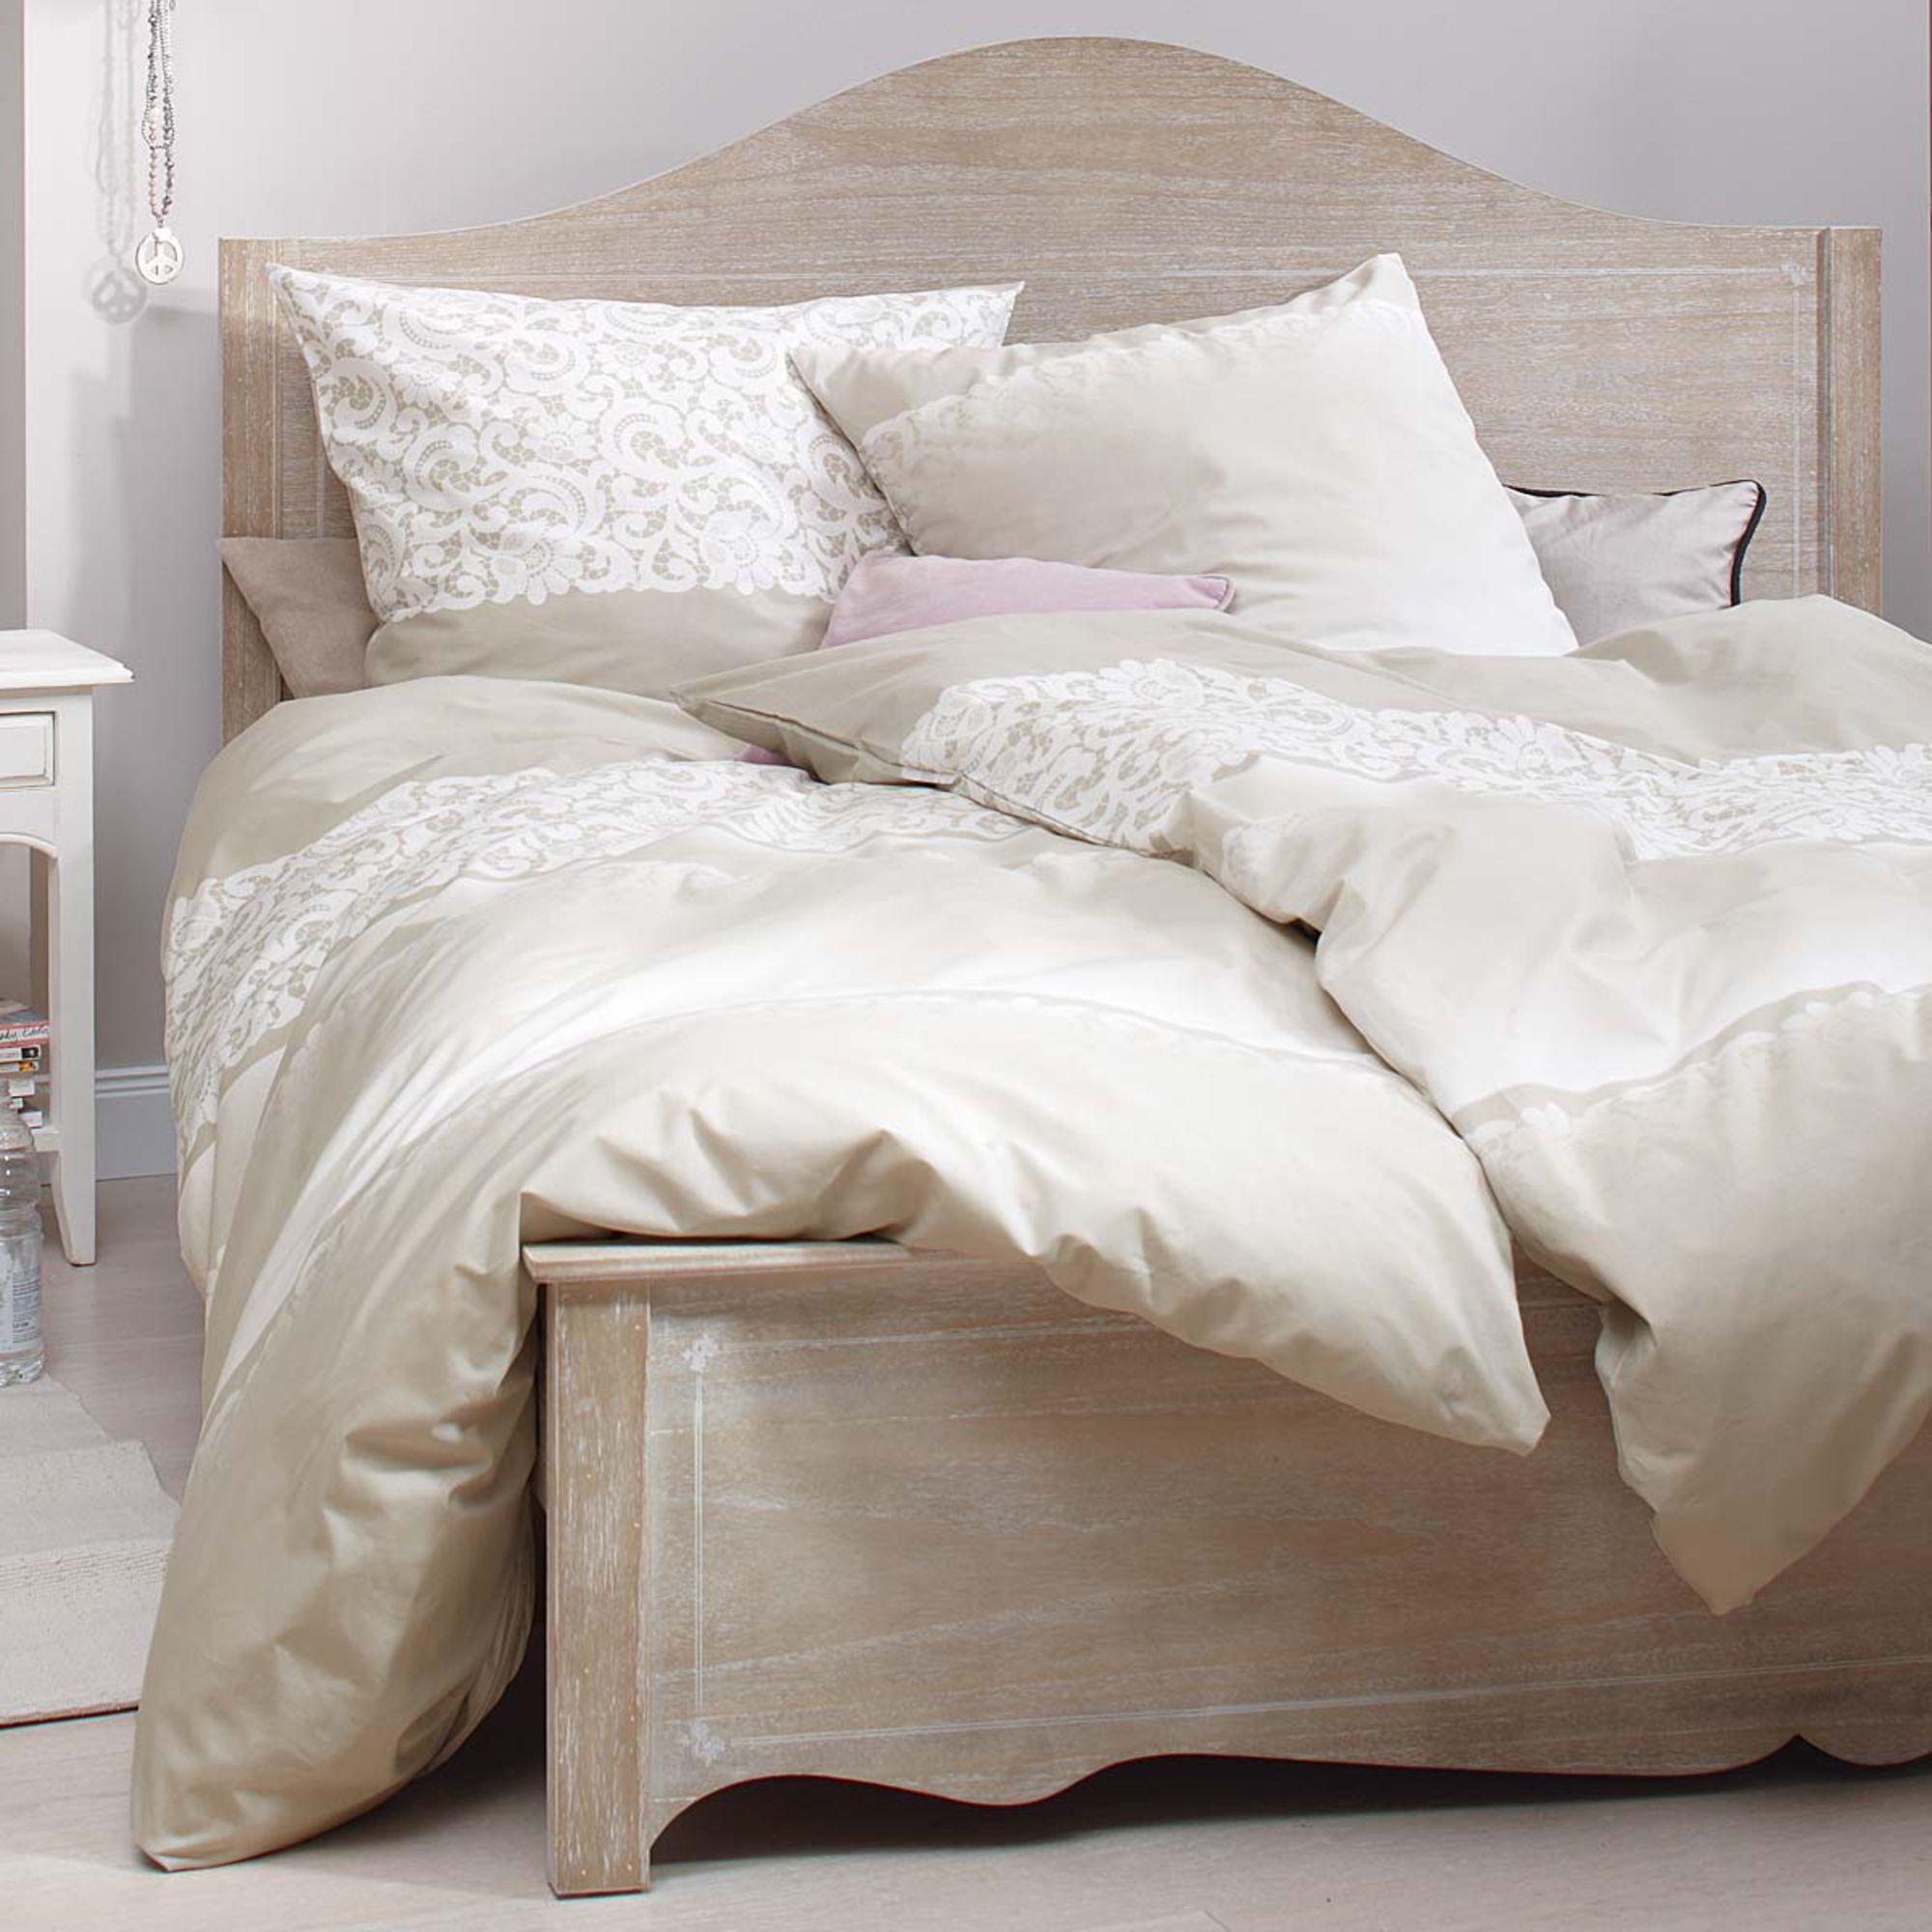 bettw sche bed sheets decor pinterest bettwaesche. Black Bedroom Furniture Sets. Home Design Ideas